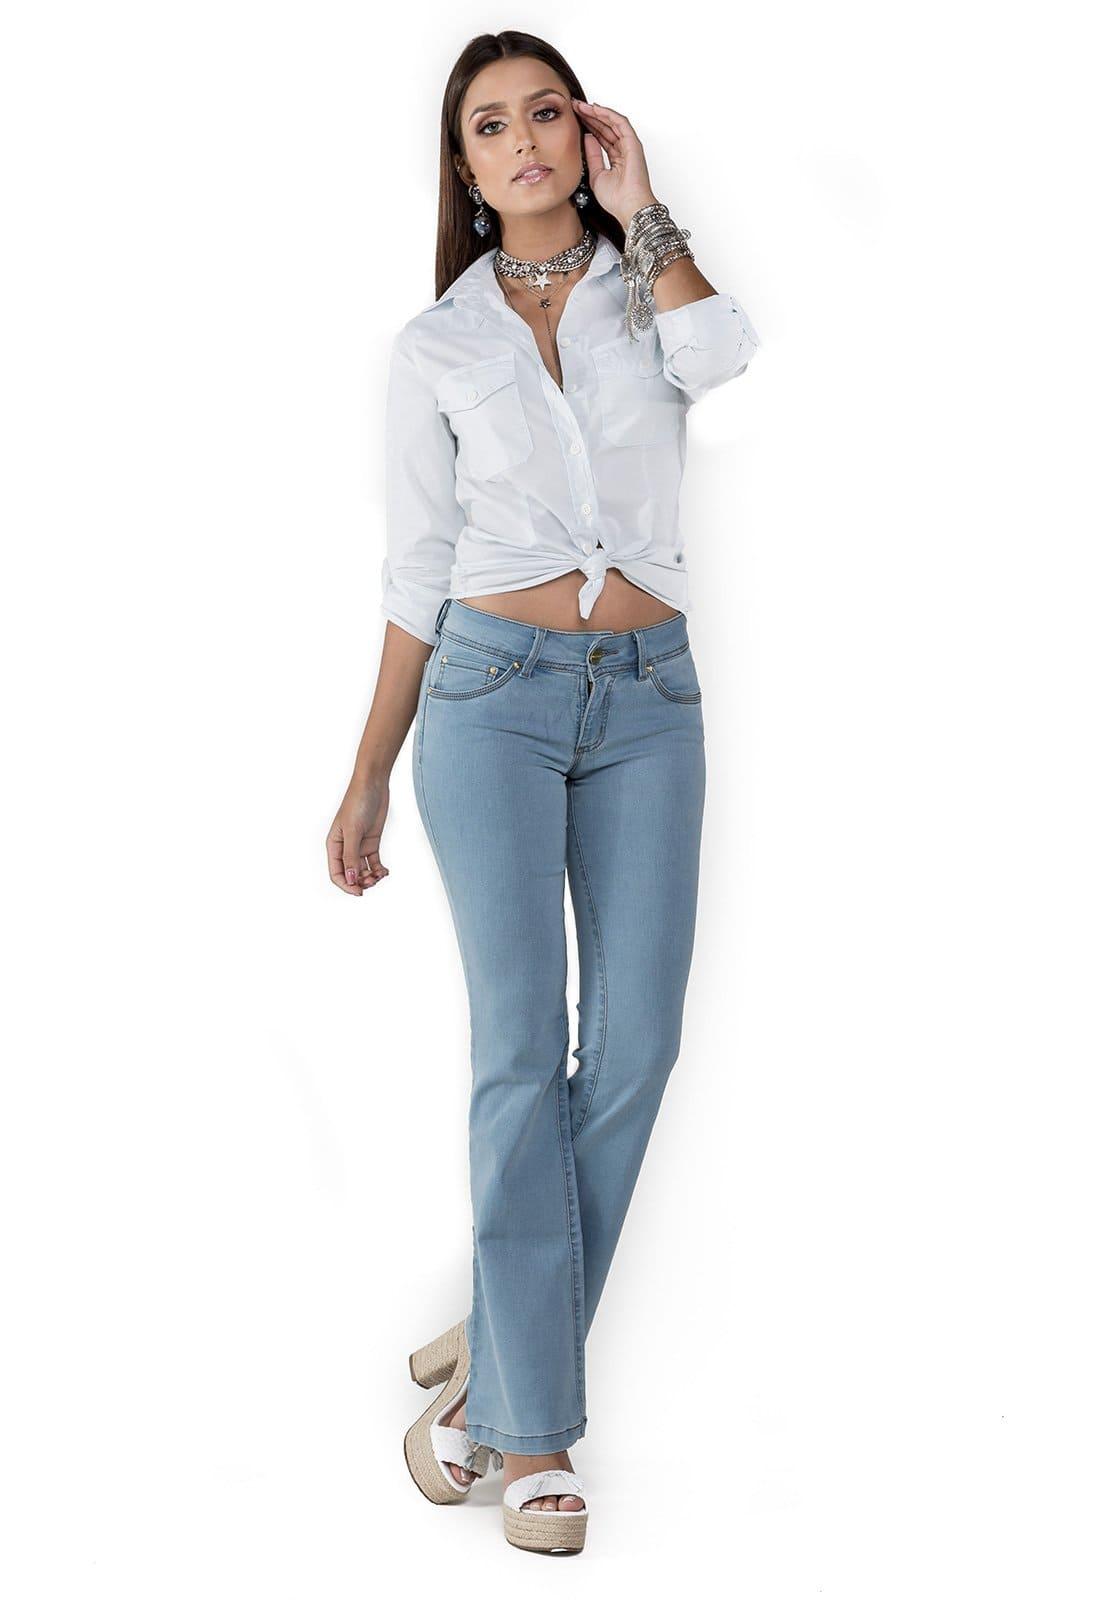 Calça Jeans Feminina Flare Intermediária Azul Claro